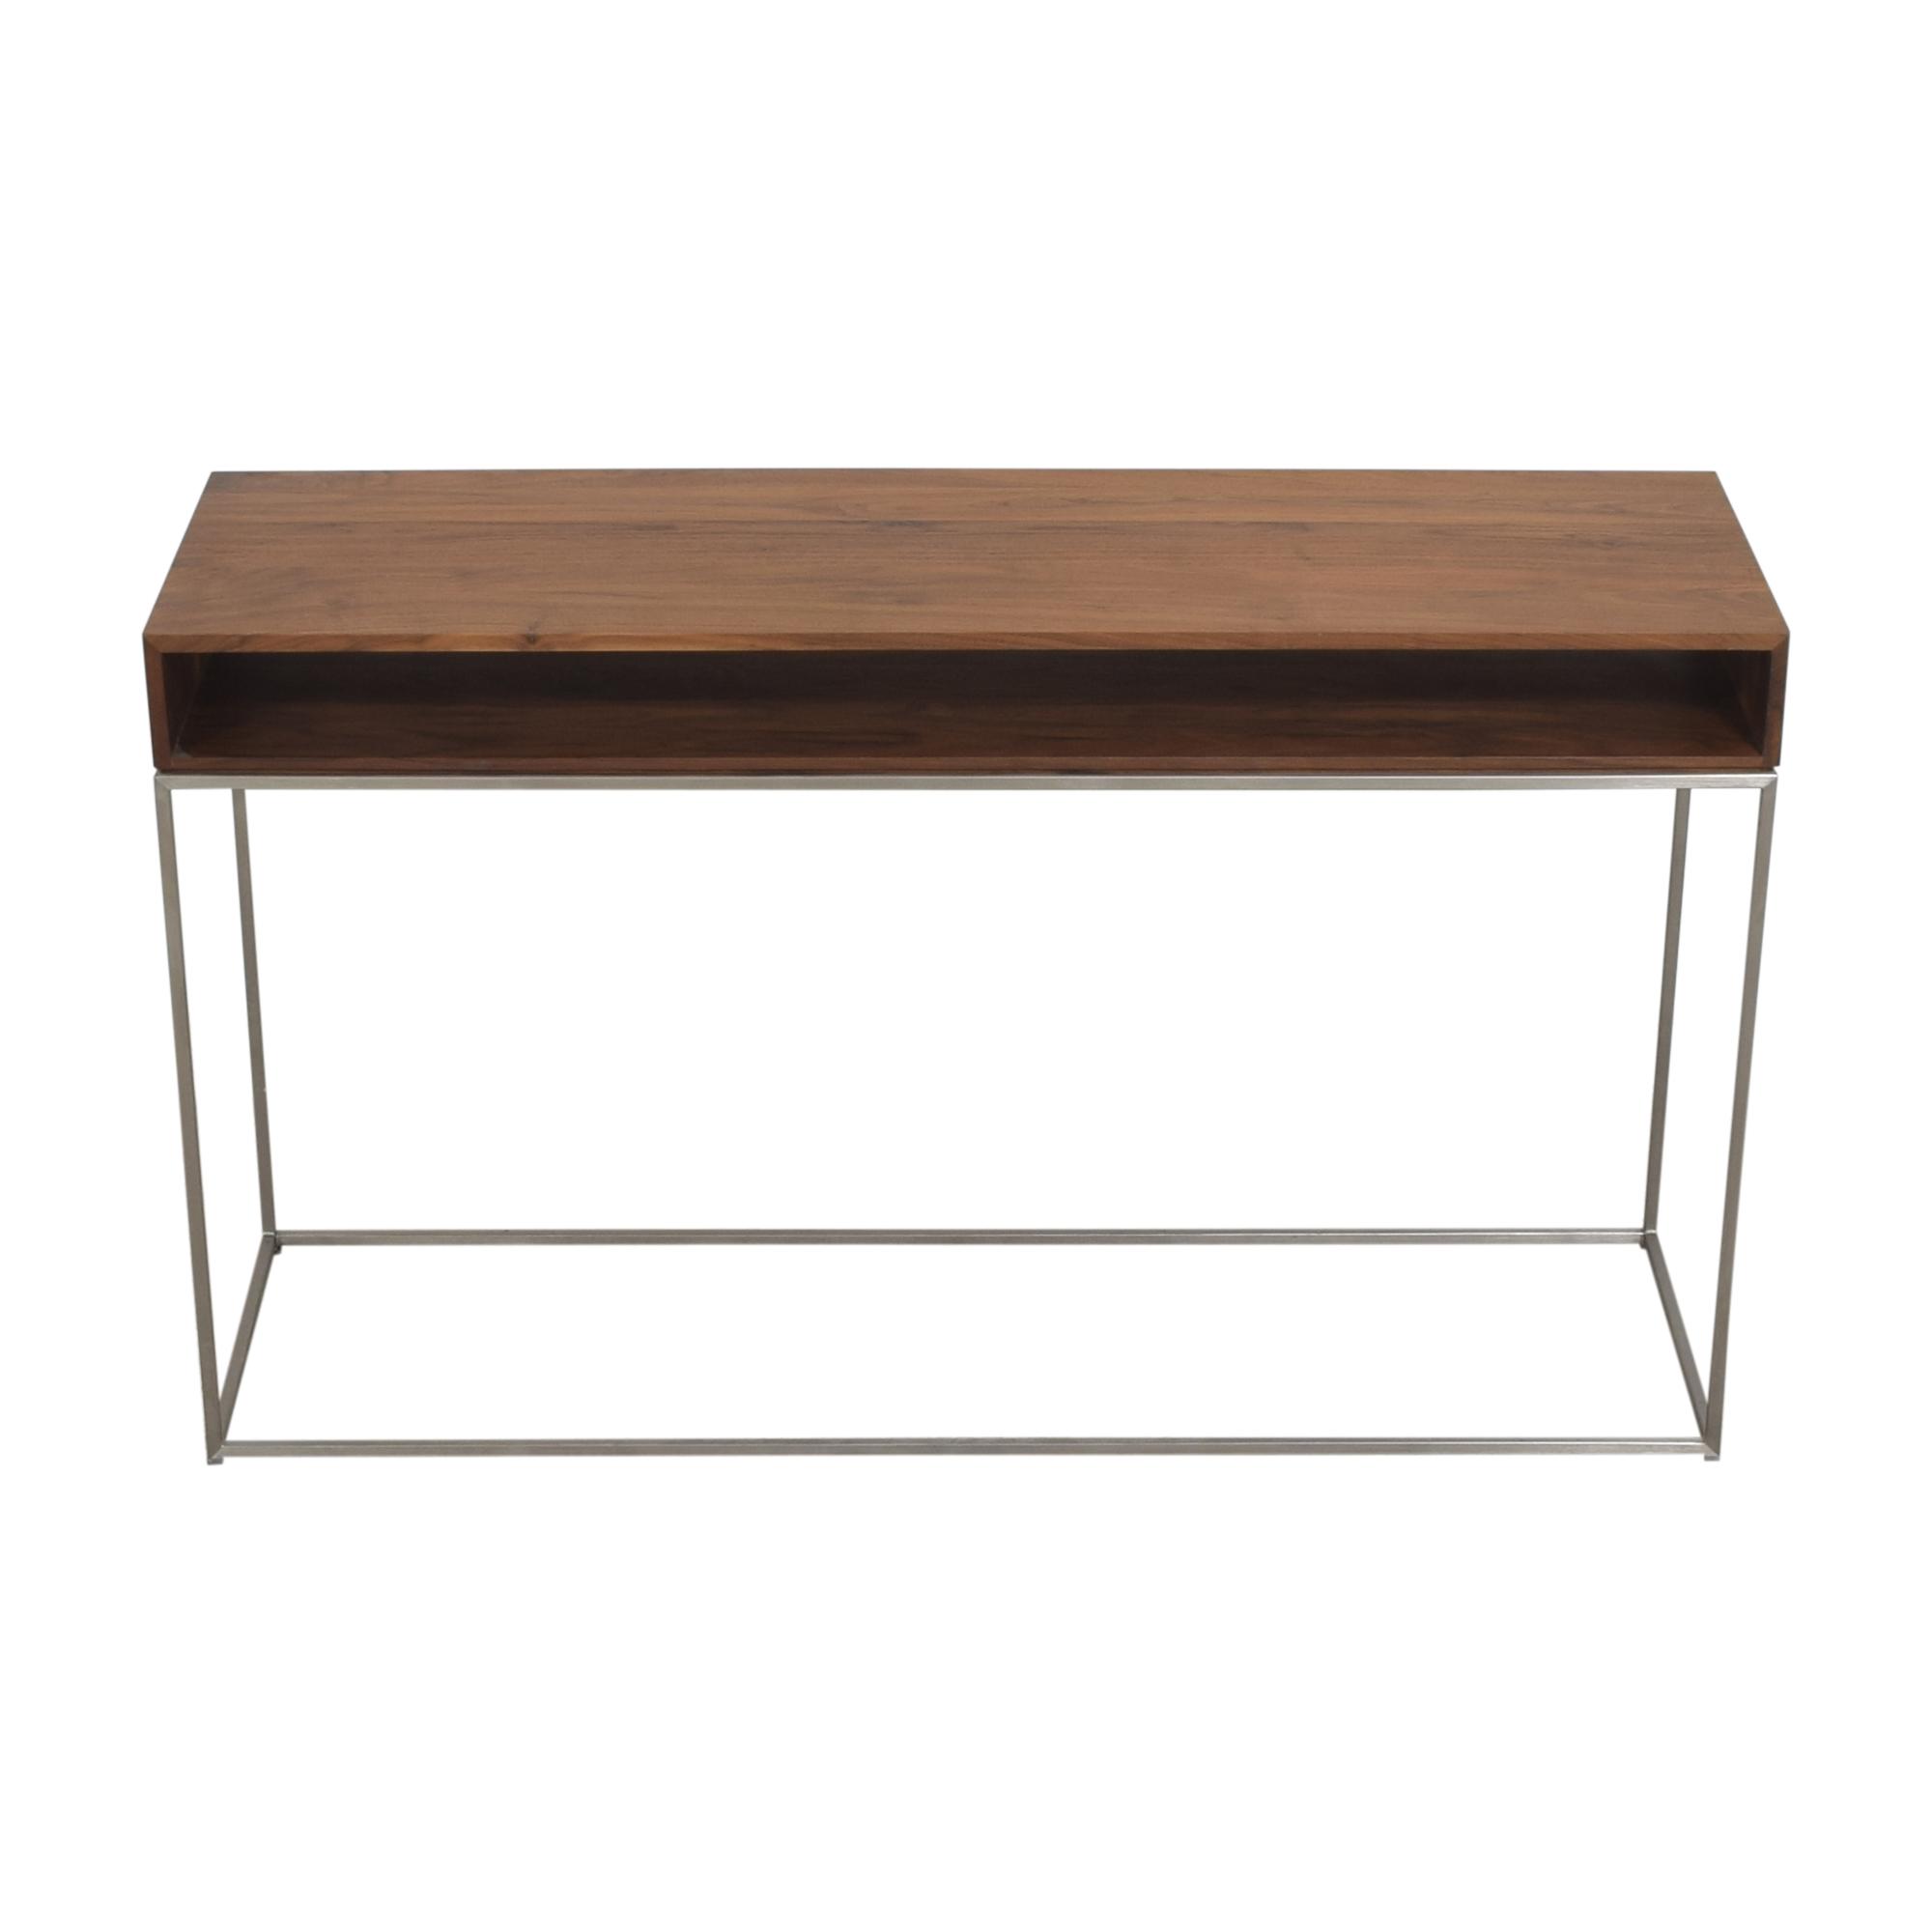 shop Crate & Barrel Frame Console Table Crate & Barrel Accent Tables